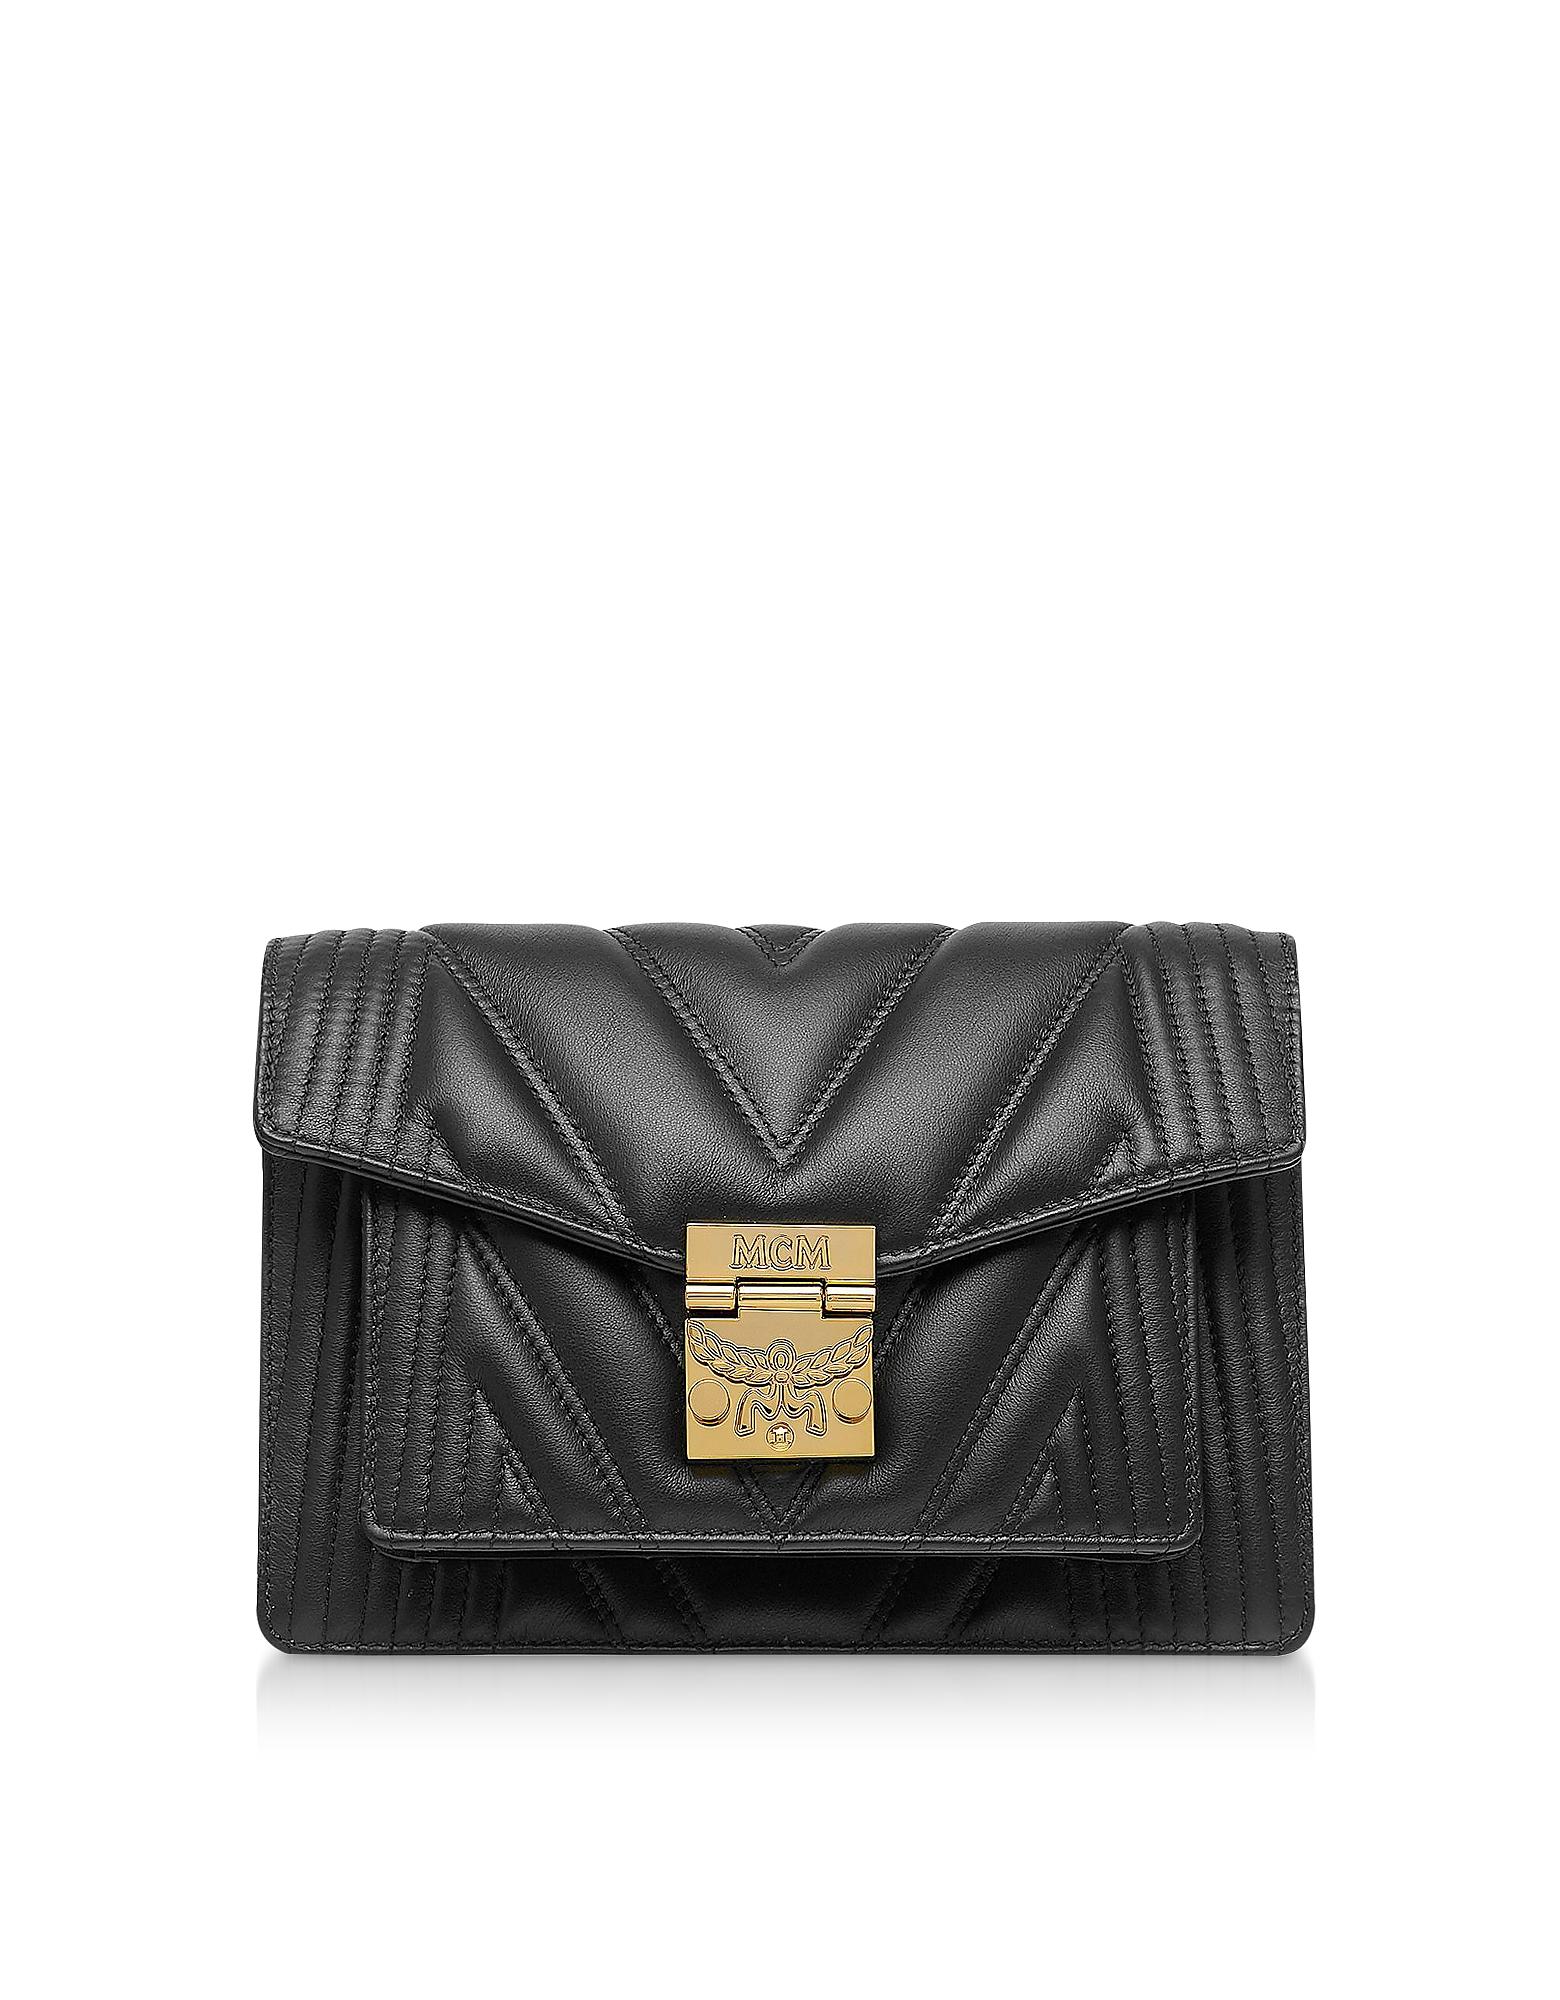 MCM Designer Handbags, Black Quilted Leather Patricia Crossbody Bag